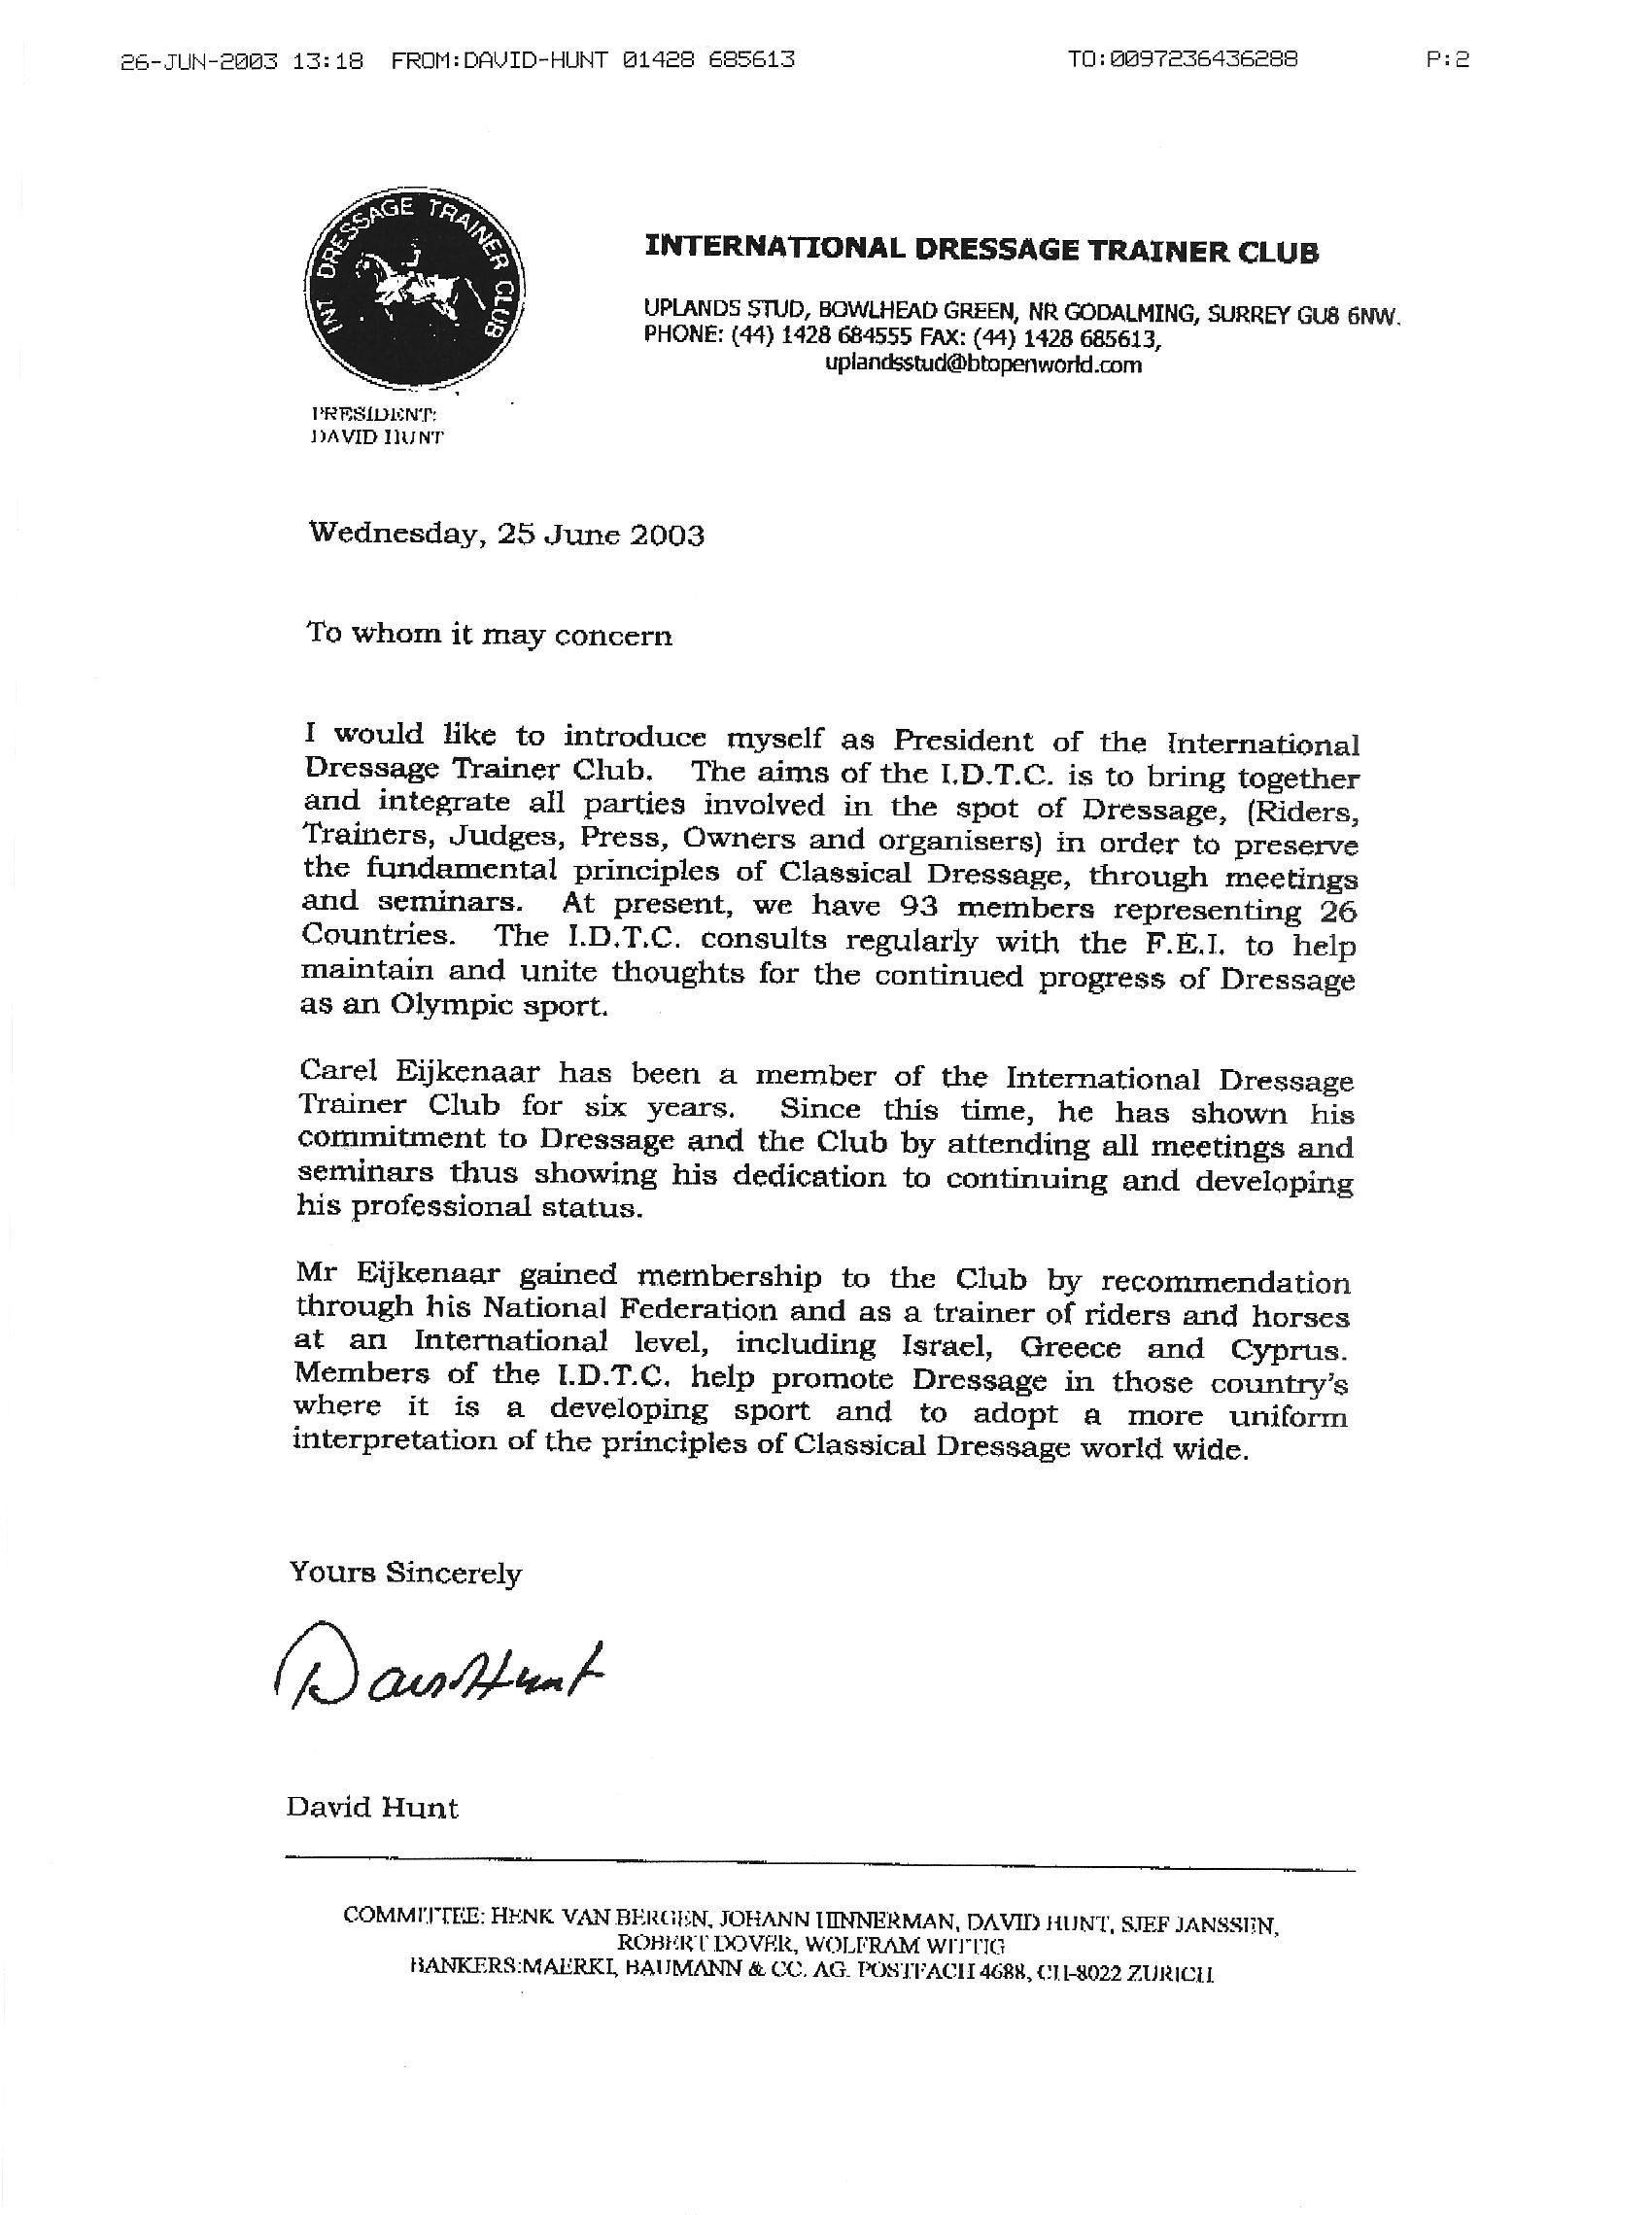 Recommendation Letter Sample Recommendation Letter Recommendations Carel Eijkenaar Dressage